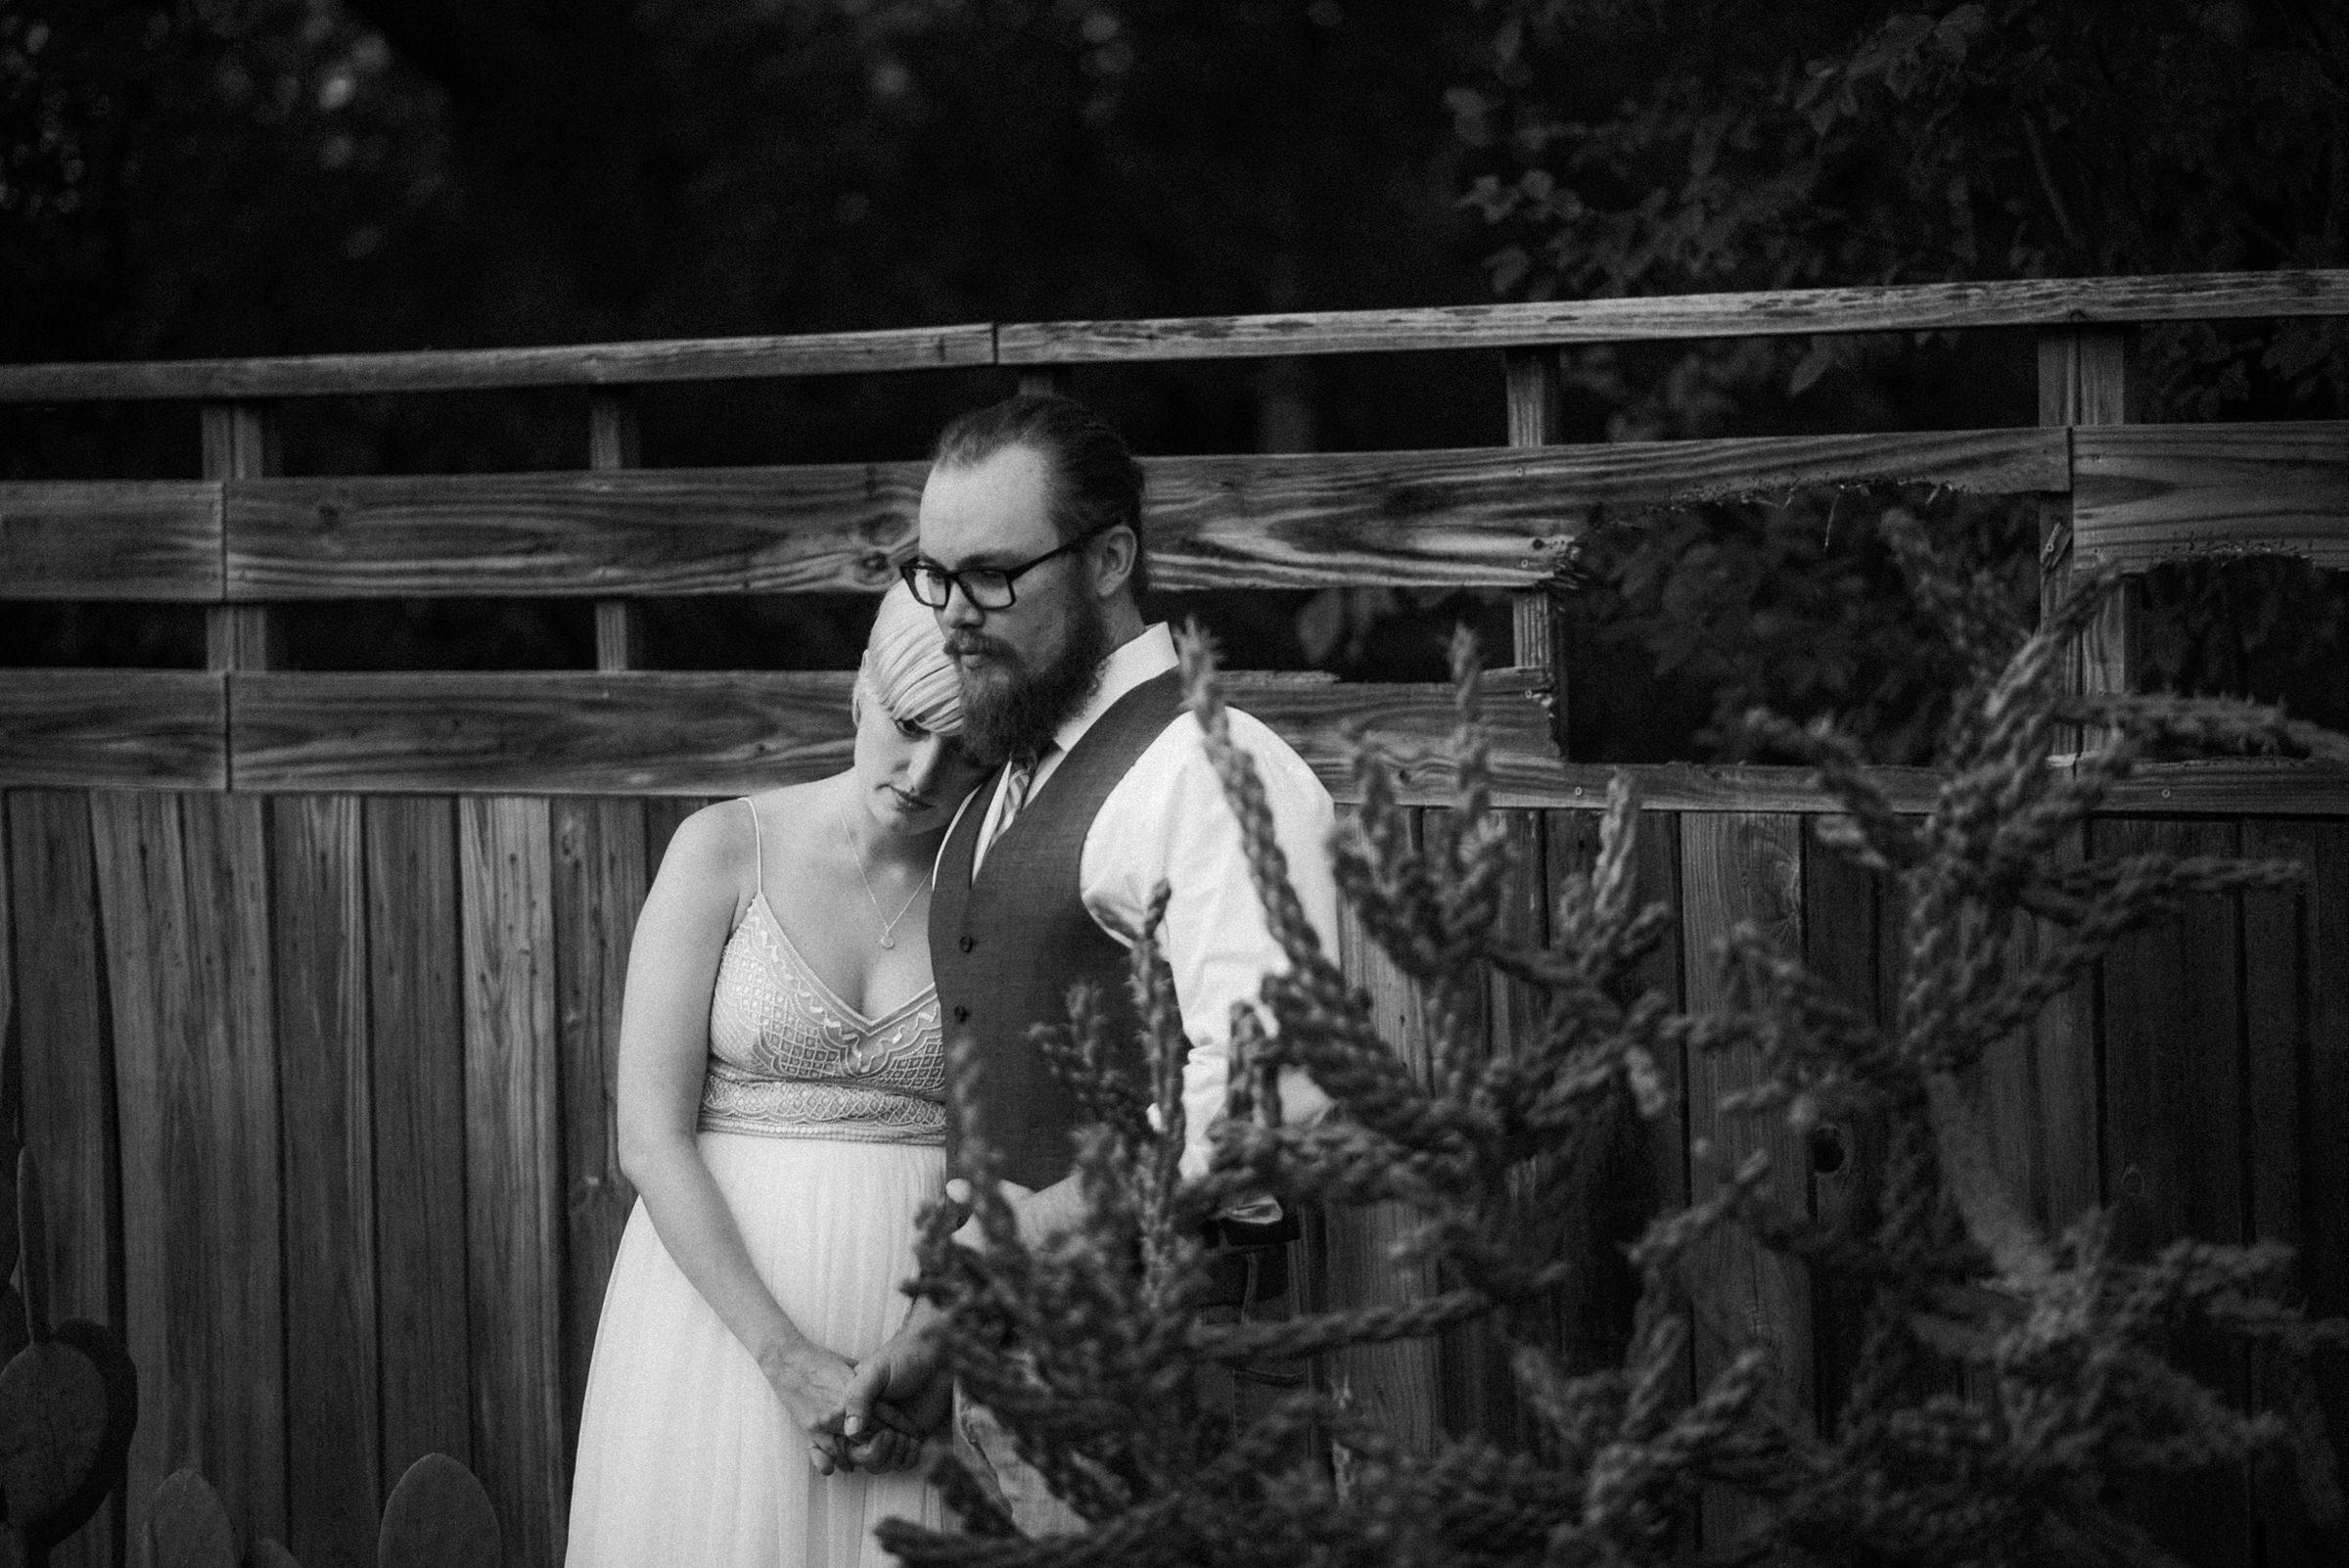 Black and White wedding portraits